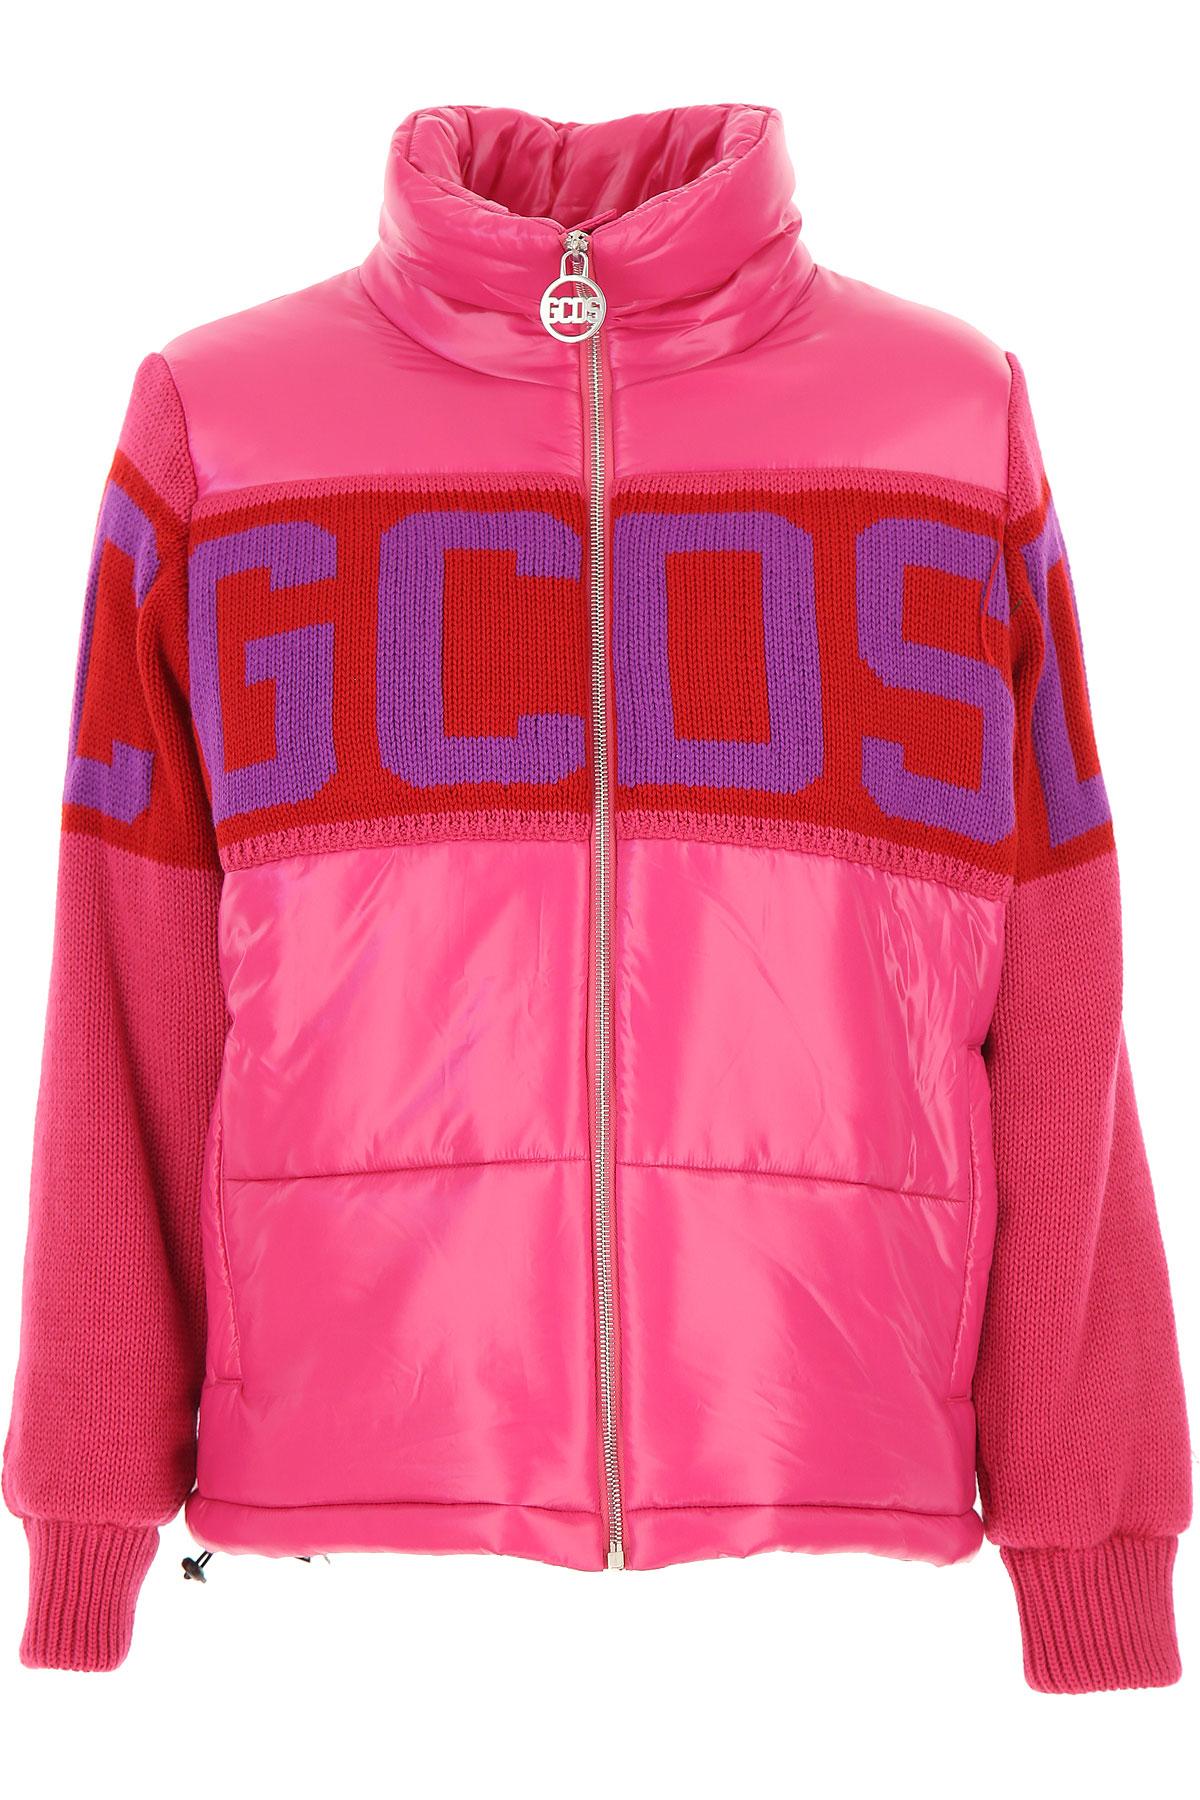 GCDS Down Jacket for Women, Puffer Ski Jacket On Sale, Pink, polyamide, 2019, 2 4 6